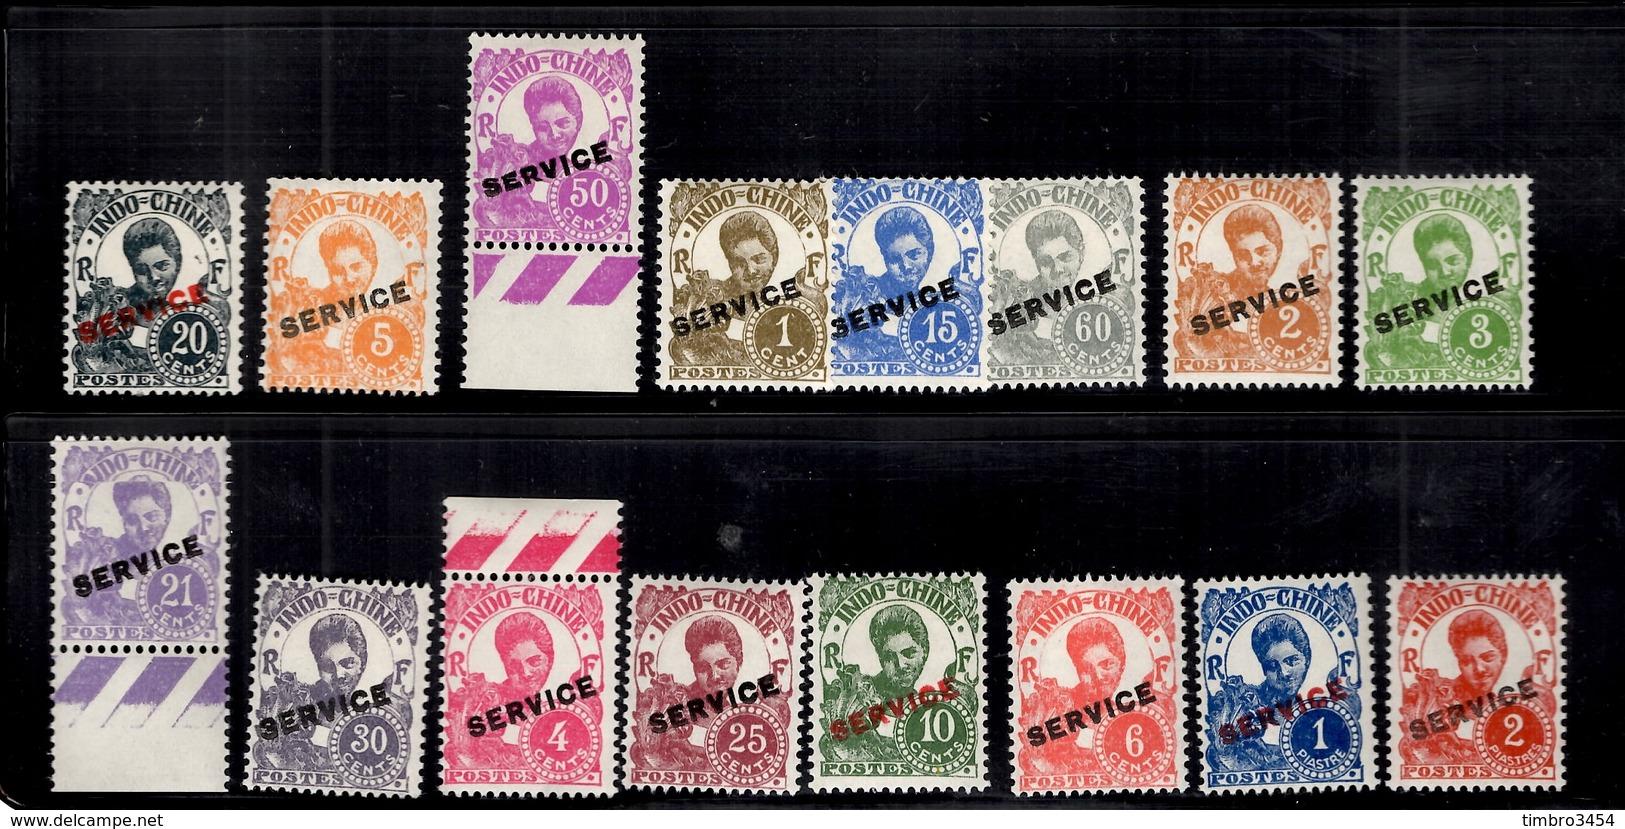 Indochine Service YT N° 17/32 Série Complète Neufs *. B/TB. A Saisir! - Indochine (1889-1945)